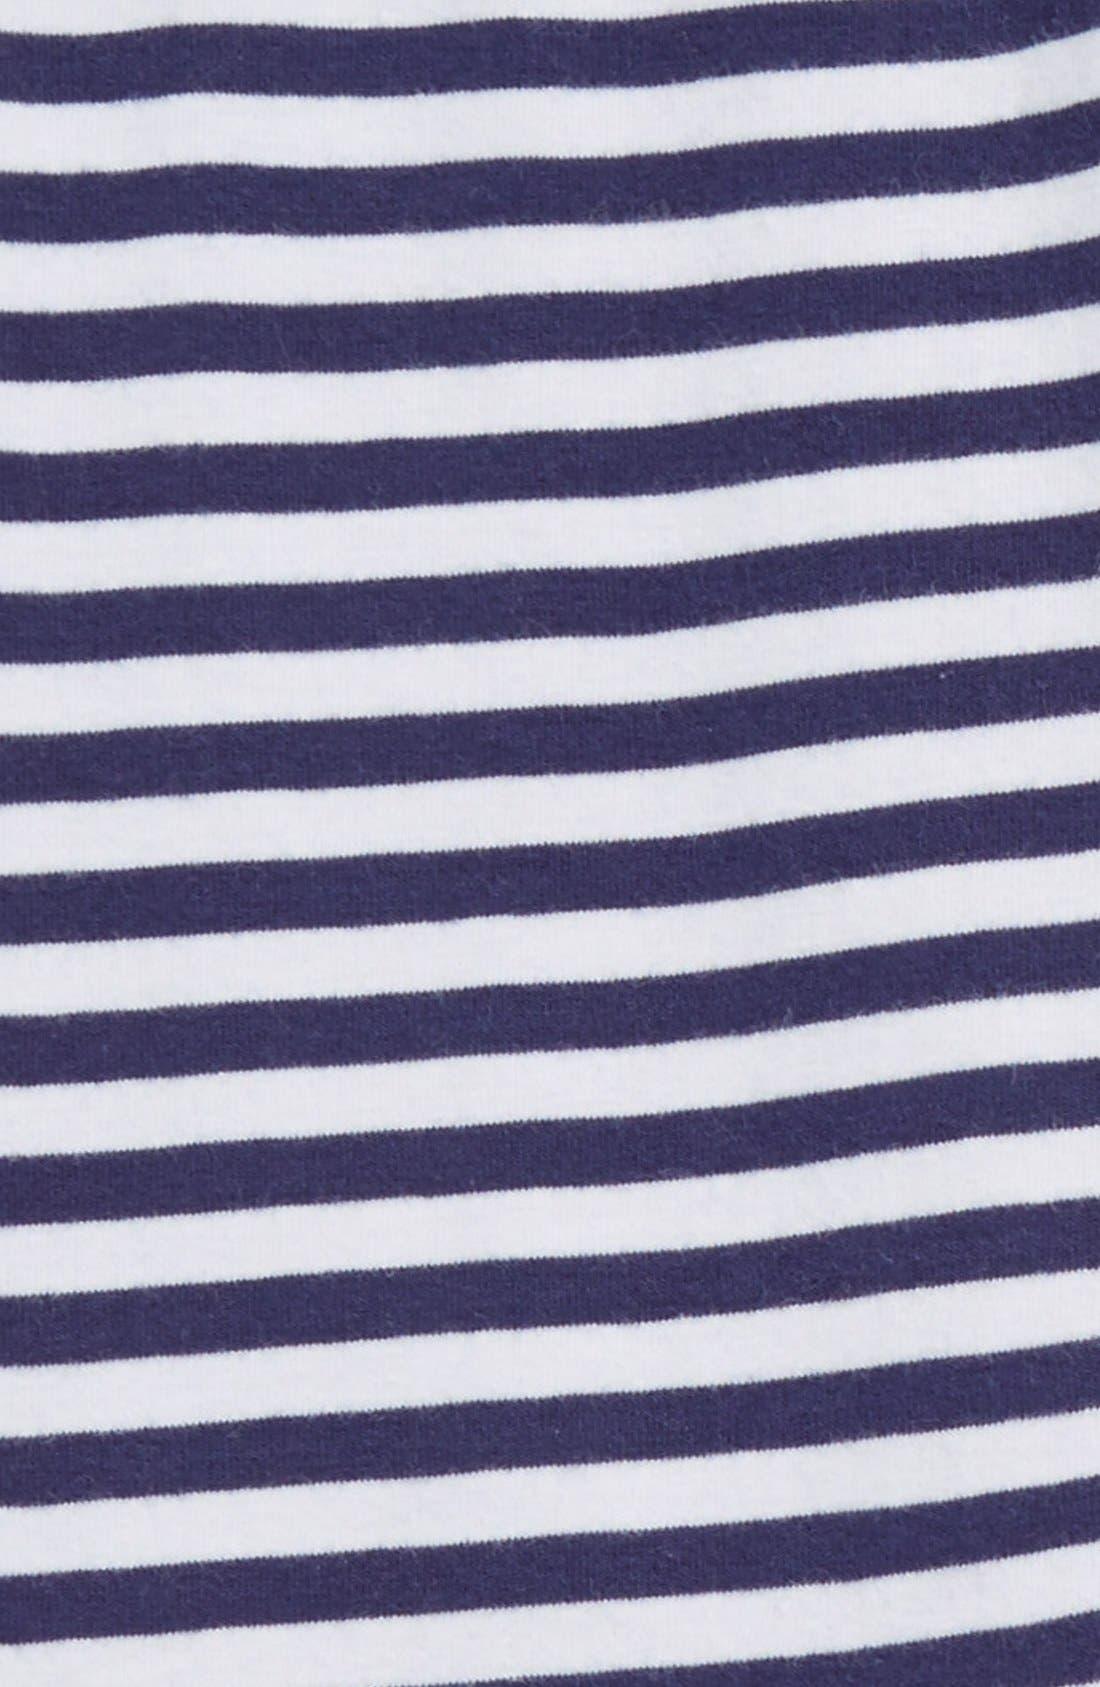 'Core' Striped Leggings,                             Alternate thumbnail 20, color,